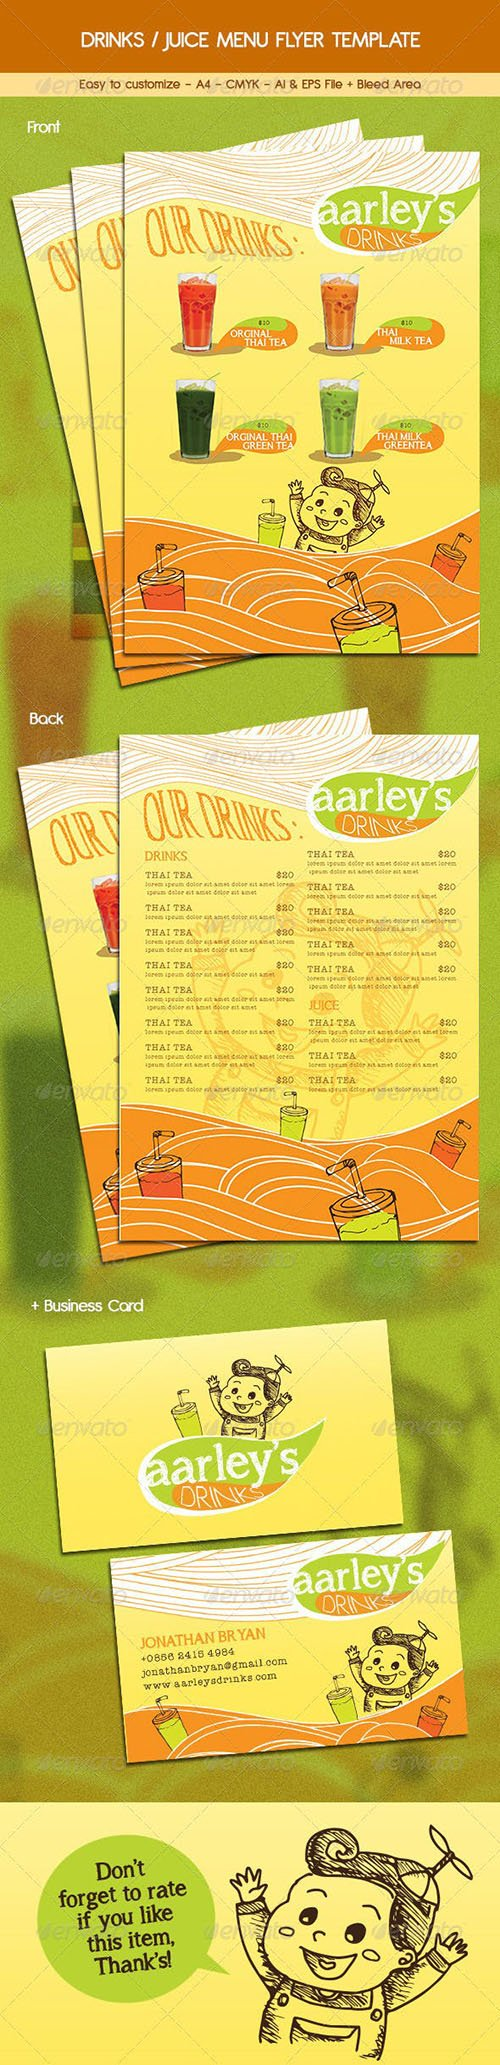 Graphicriver - Drinks / Juice Menu Flyer 6455835